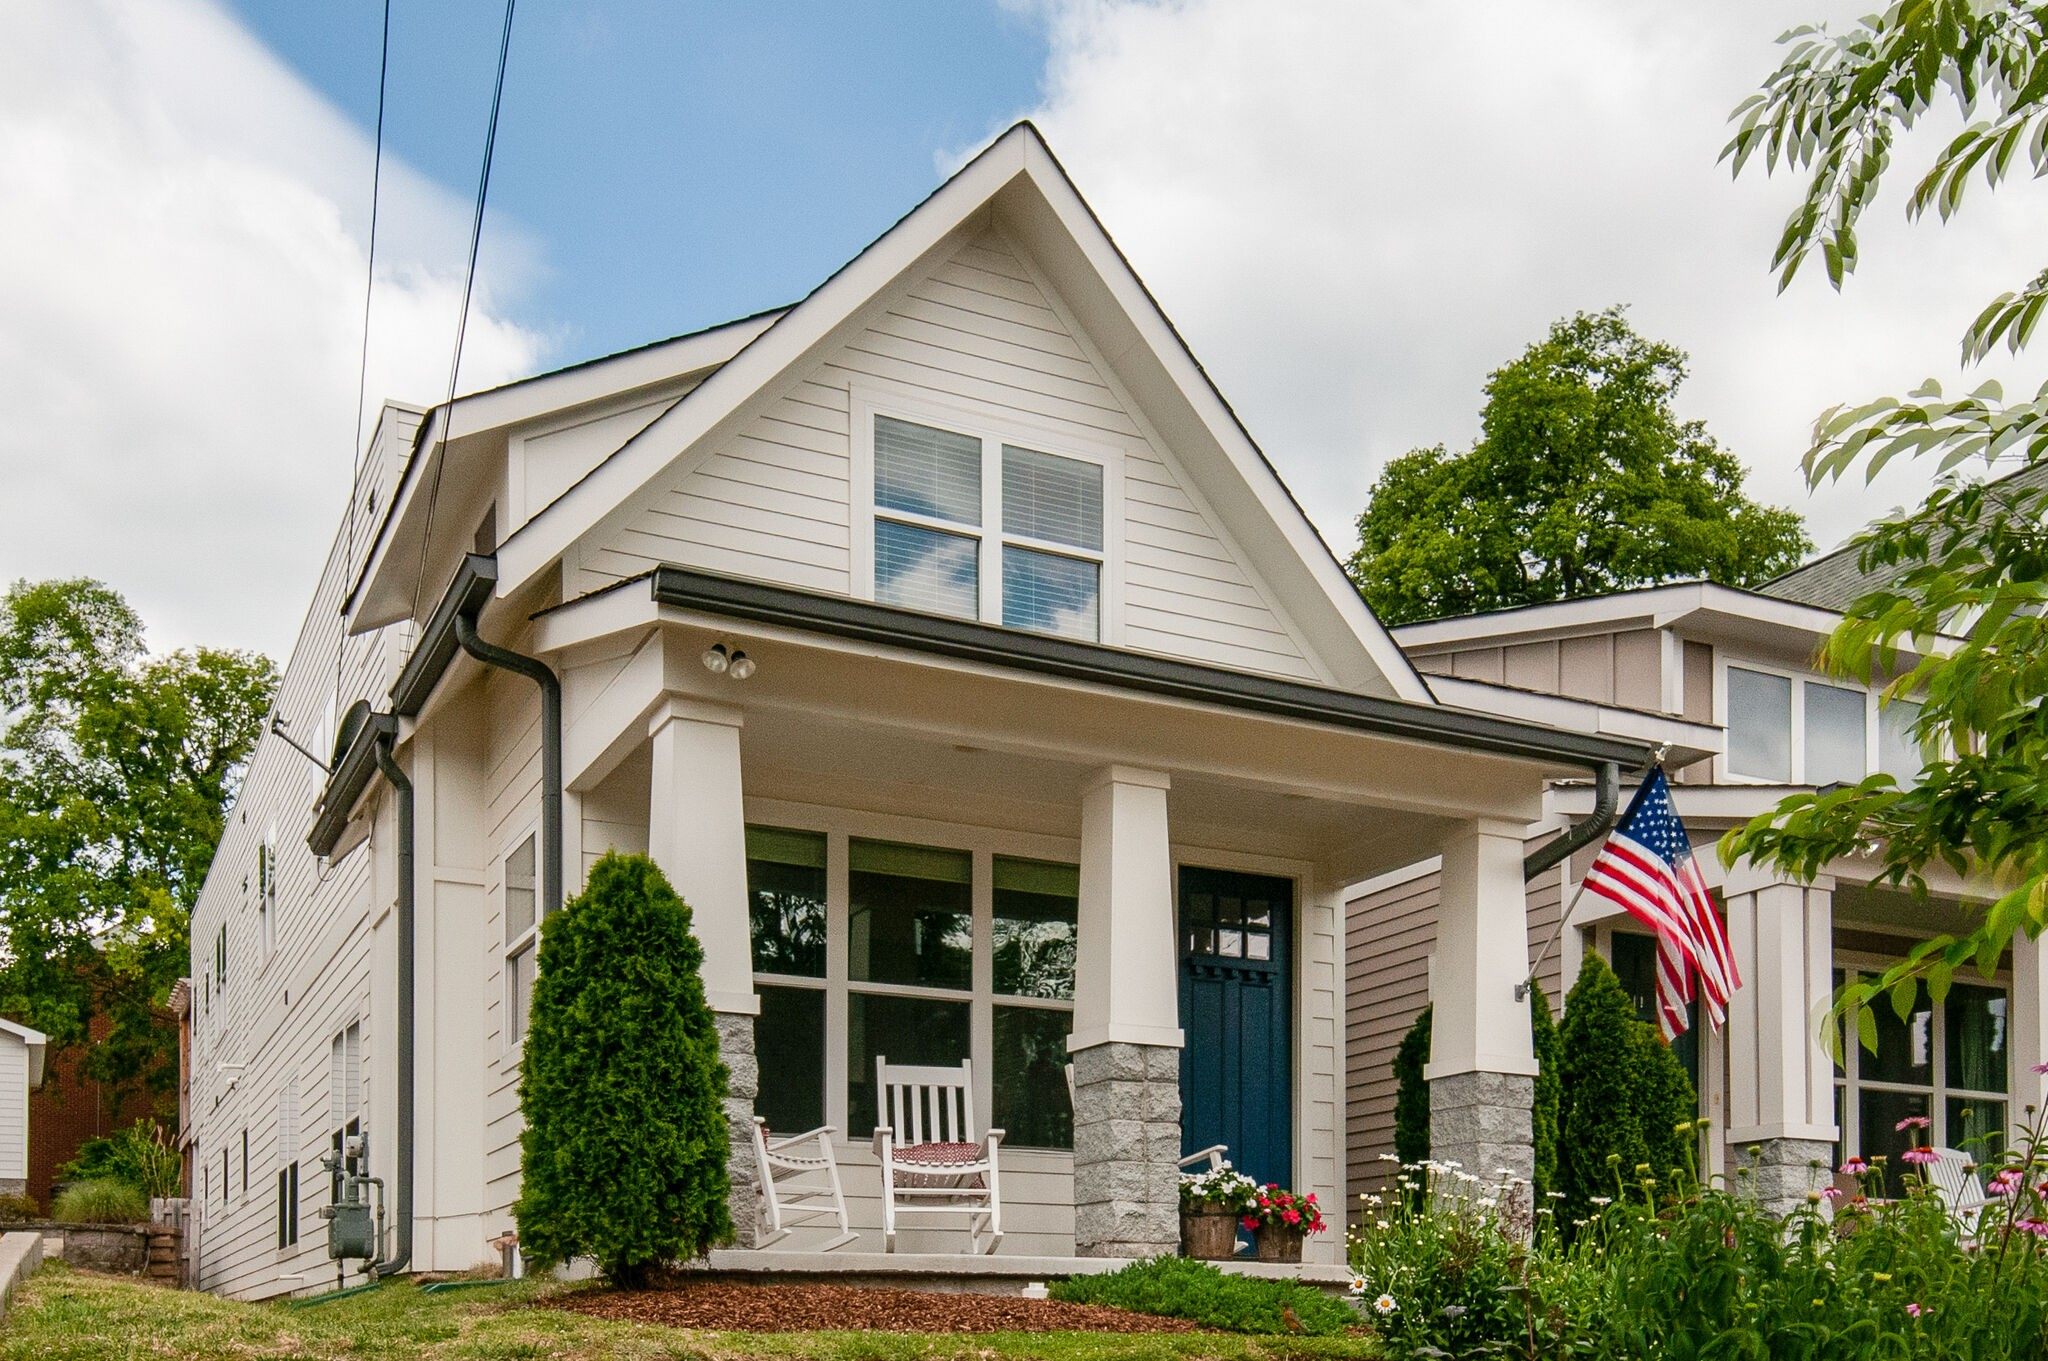 2213B 11th Ave S Property Photo - Nashville, TN real estate listing